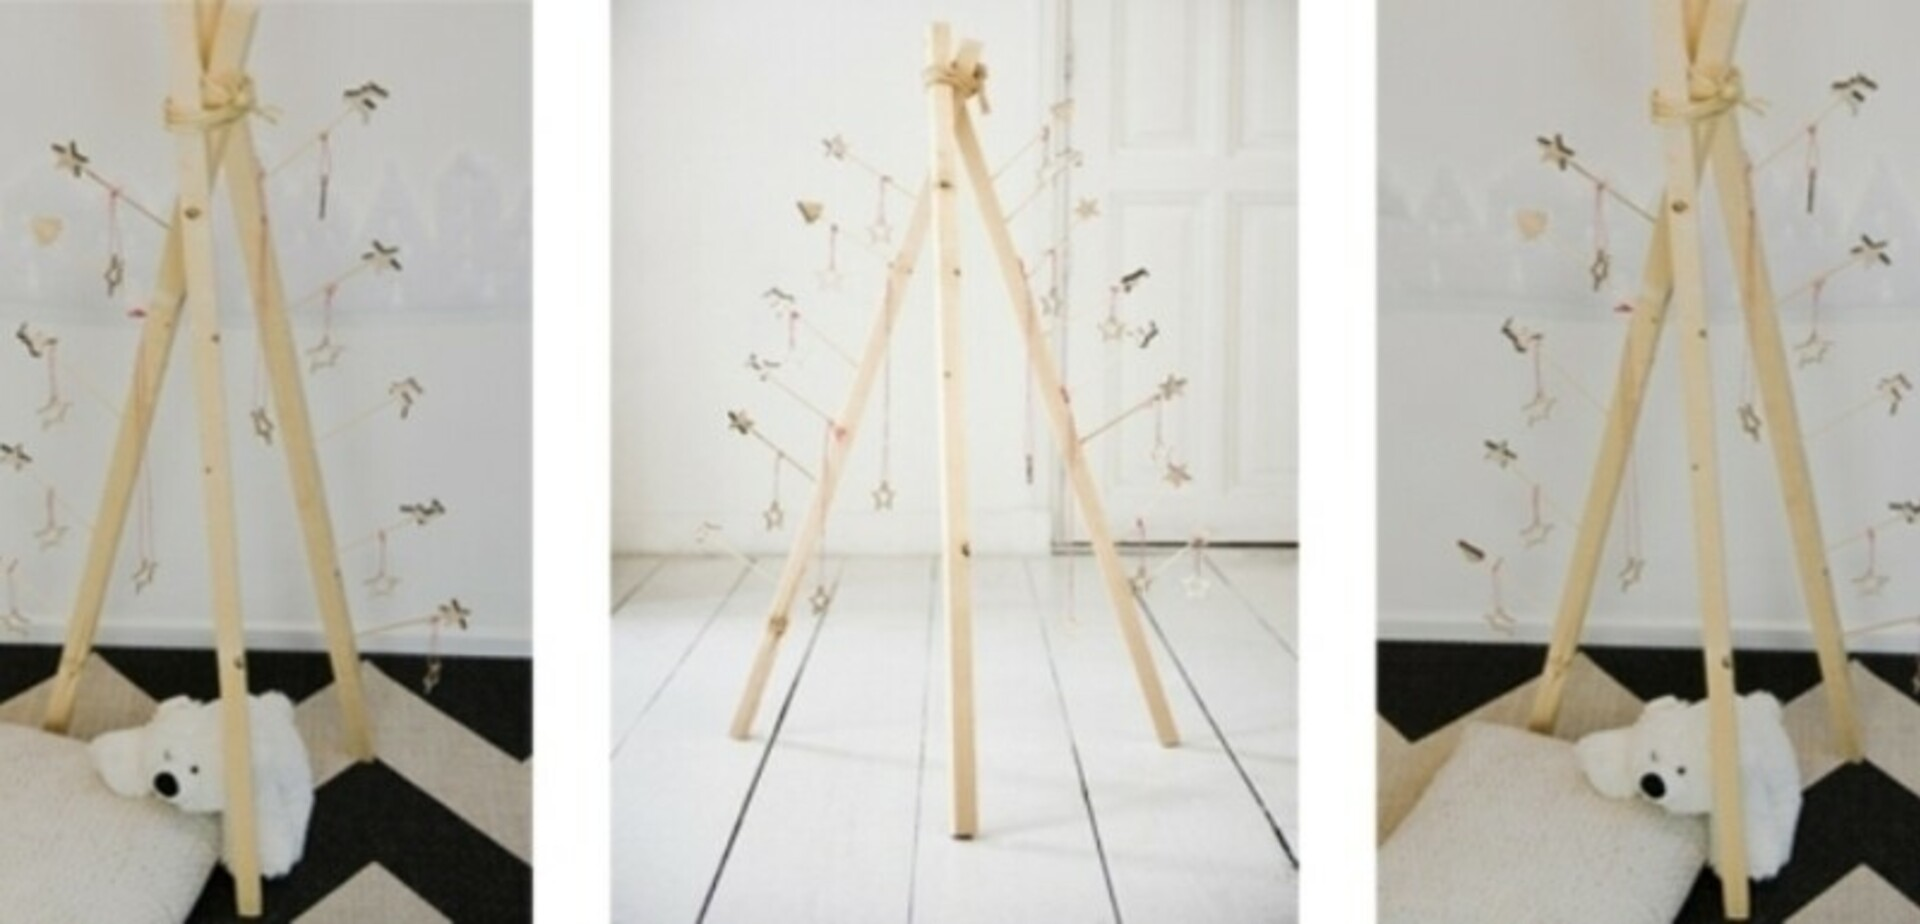 fabriquer son propre sapin tipi pour les makers. Black Bedroom Furniture Sets. Home Design Ideas